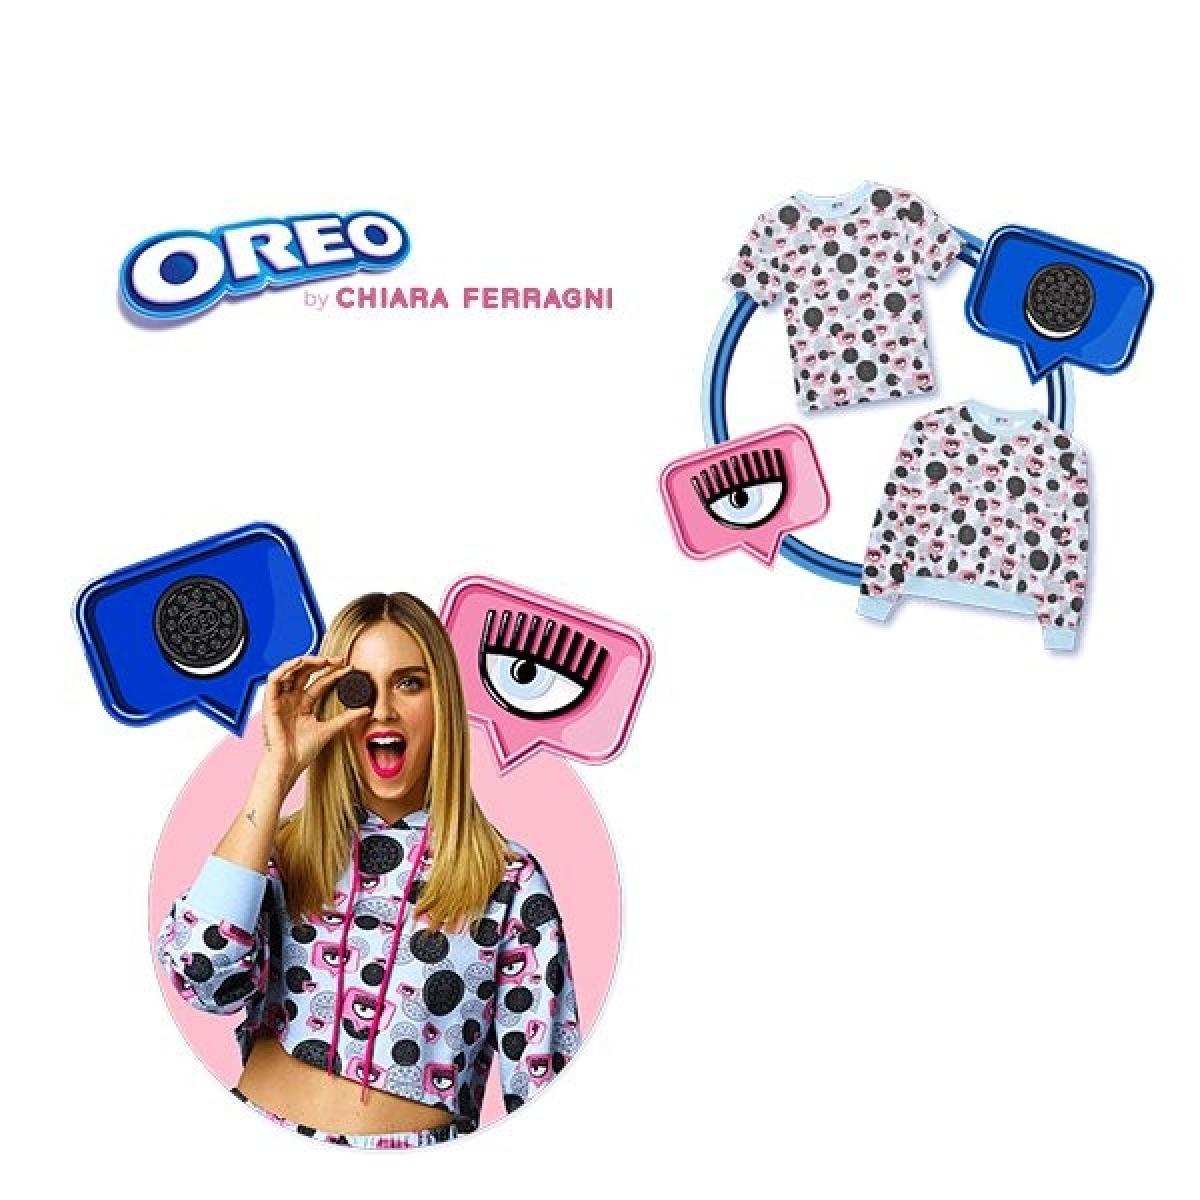 Chiara Ferragni themed products